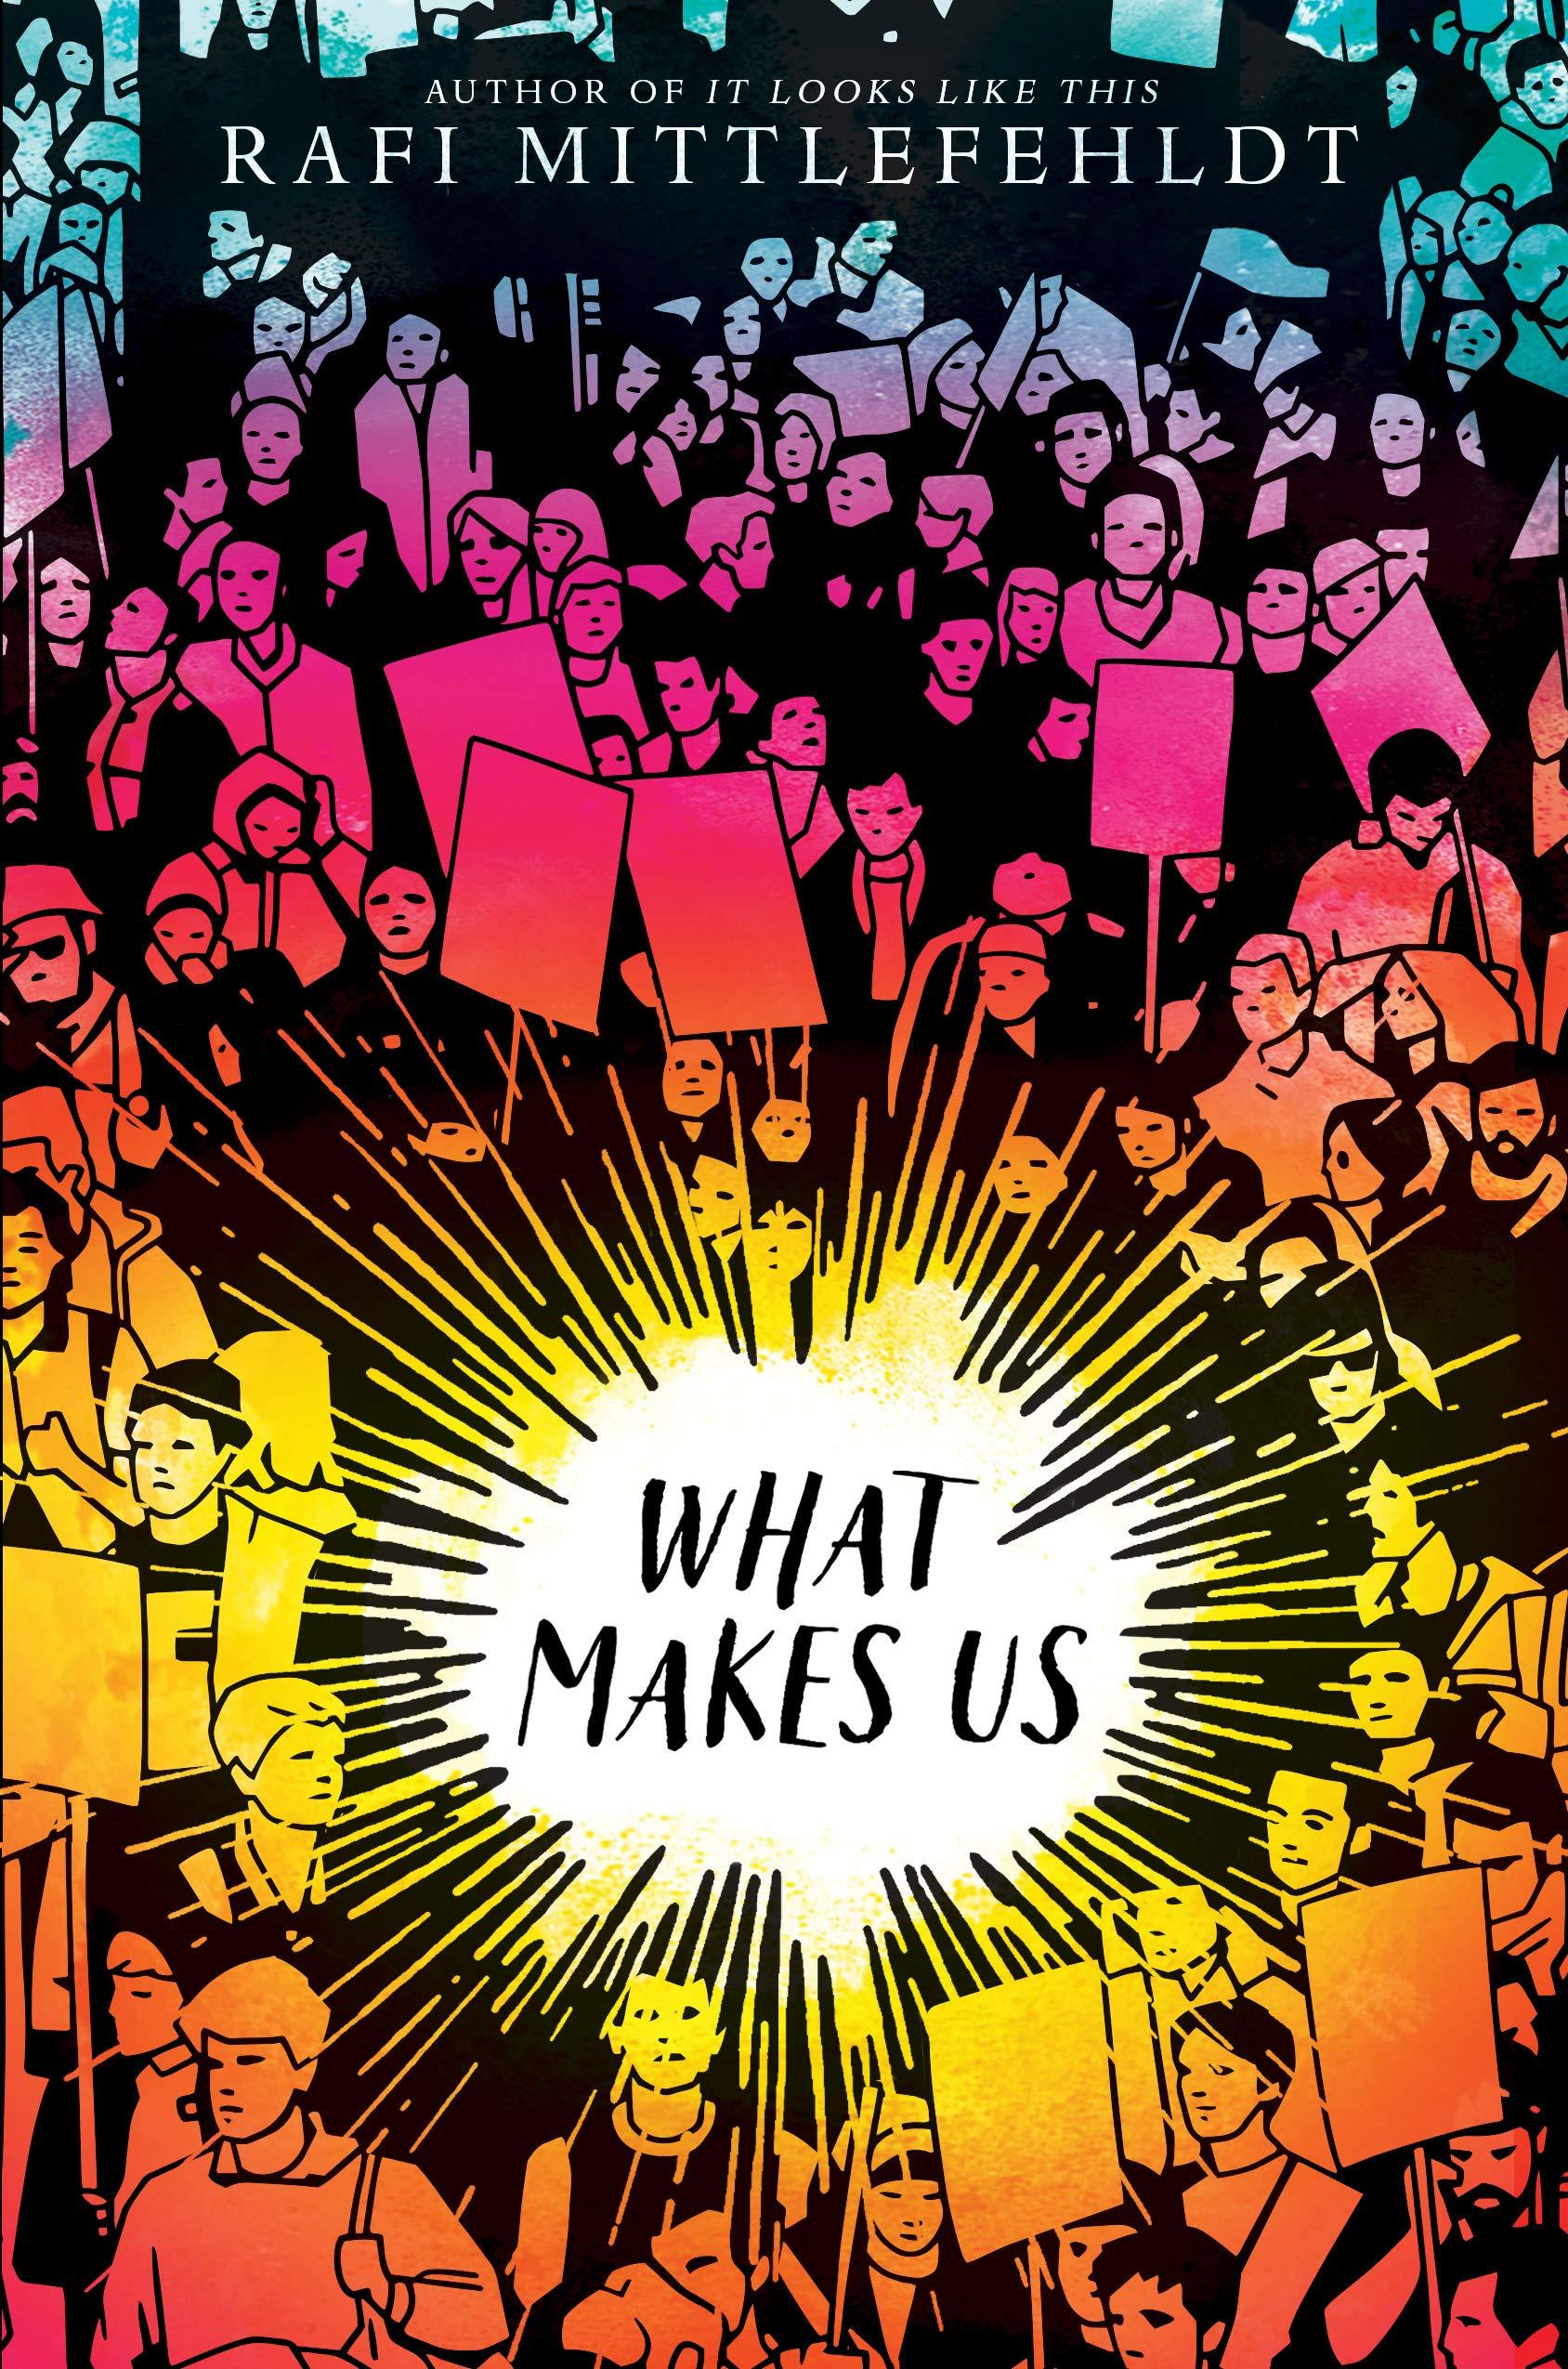 Amazon.com: What Makes Us (9780763697501): Mittlefehldt, Rafi: Books